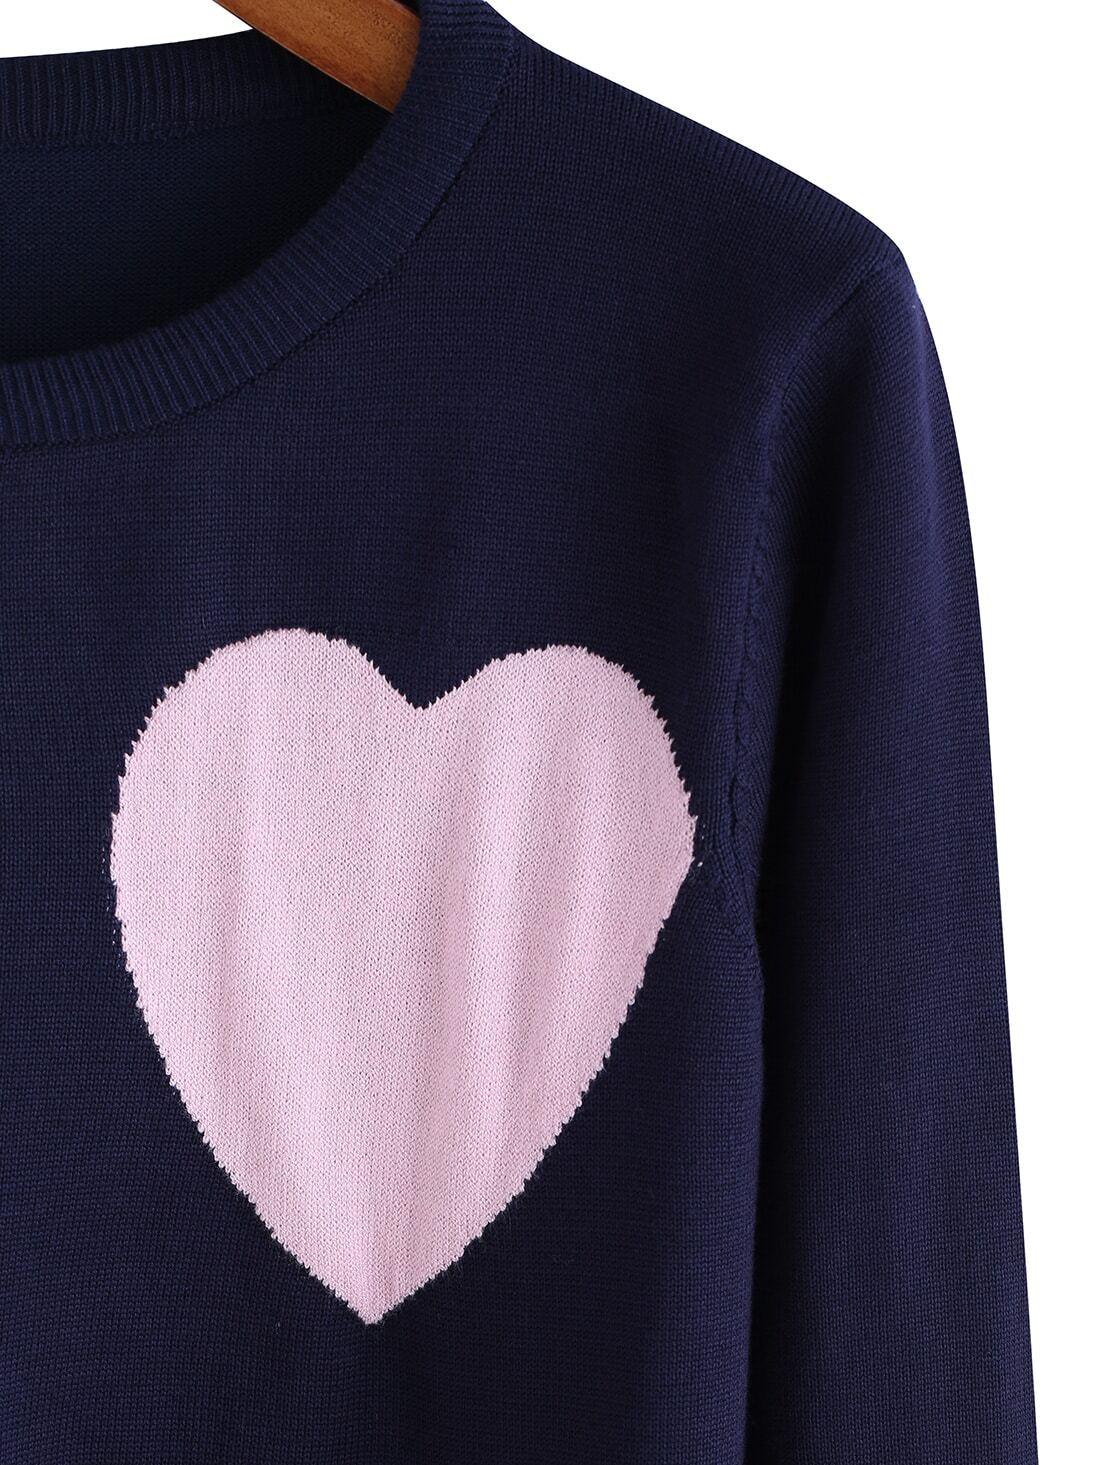 Knitting Pattern Heart Sweater : Blue Round Neck Heart Pattern Knit Sweater -SheIn(Sheinside)